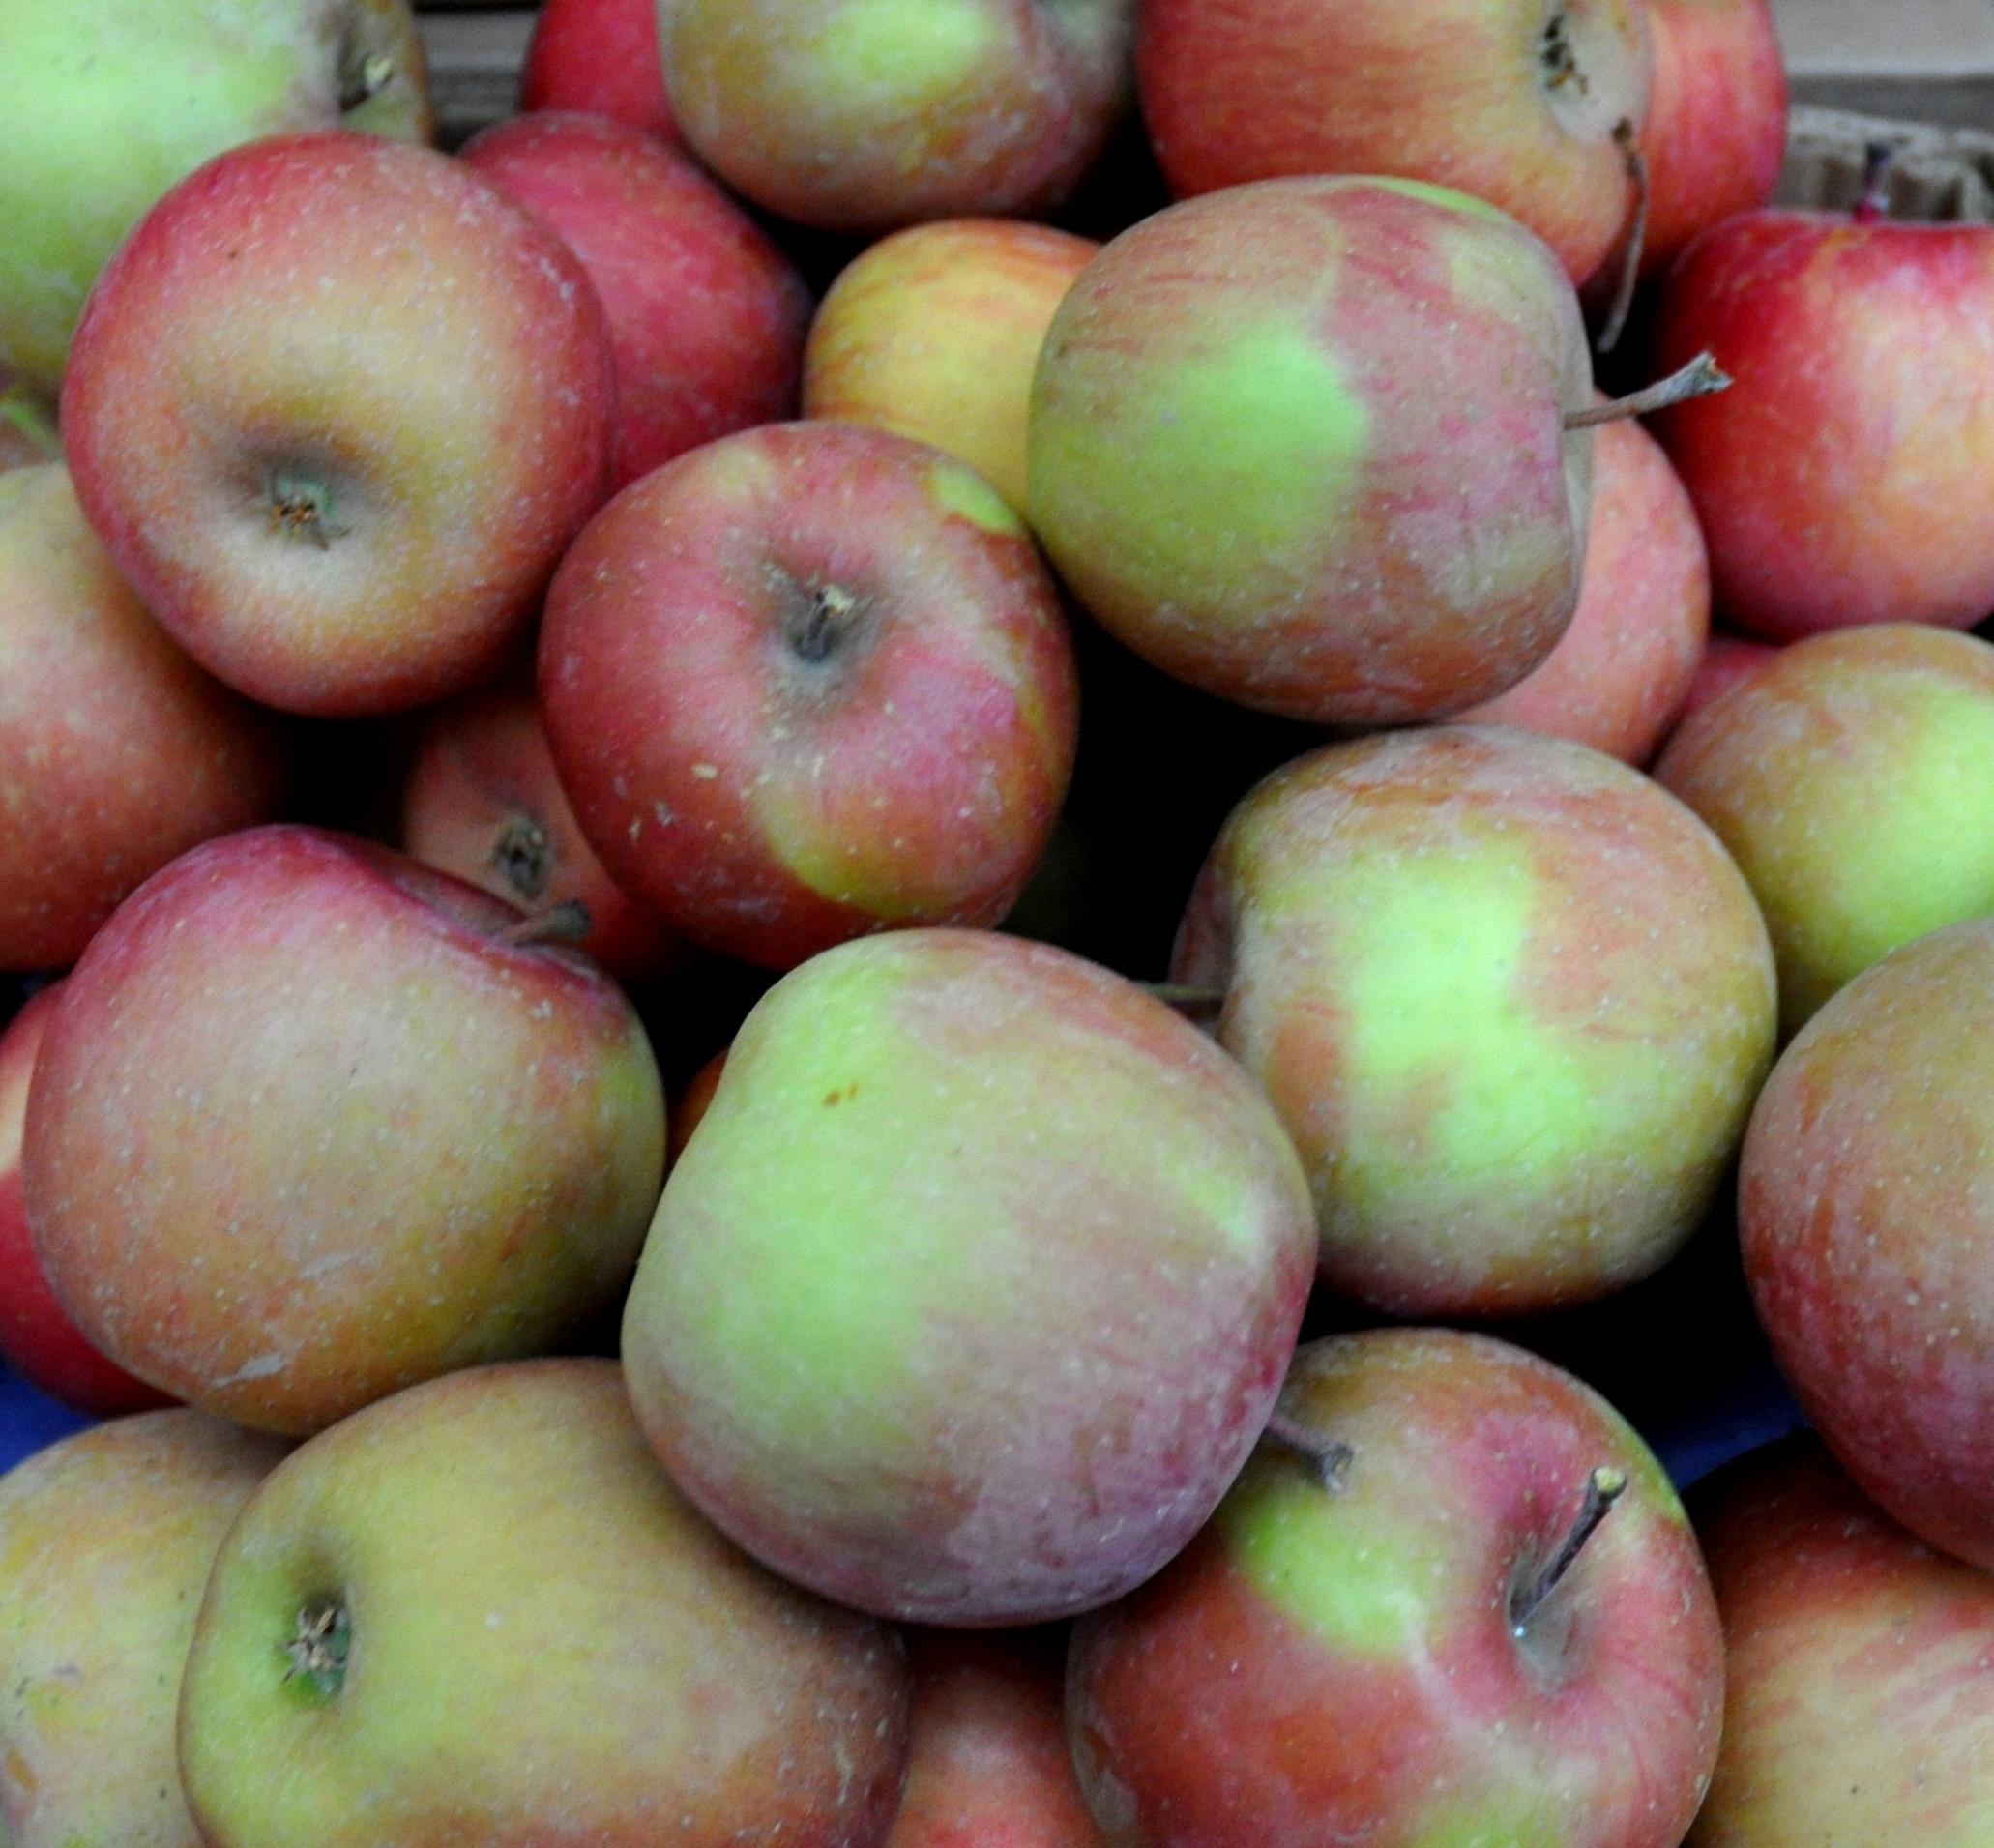 Mt. Fuji apples from Tiny's Organic Produce. Photo copyright 2013 by Zachary D. Lyons.